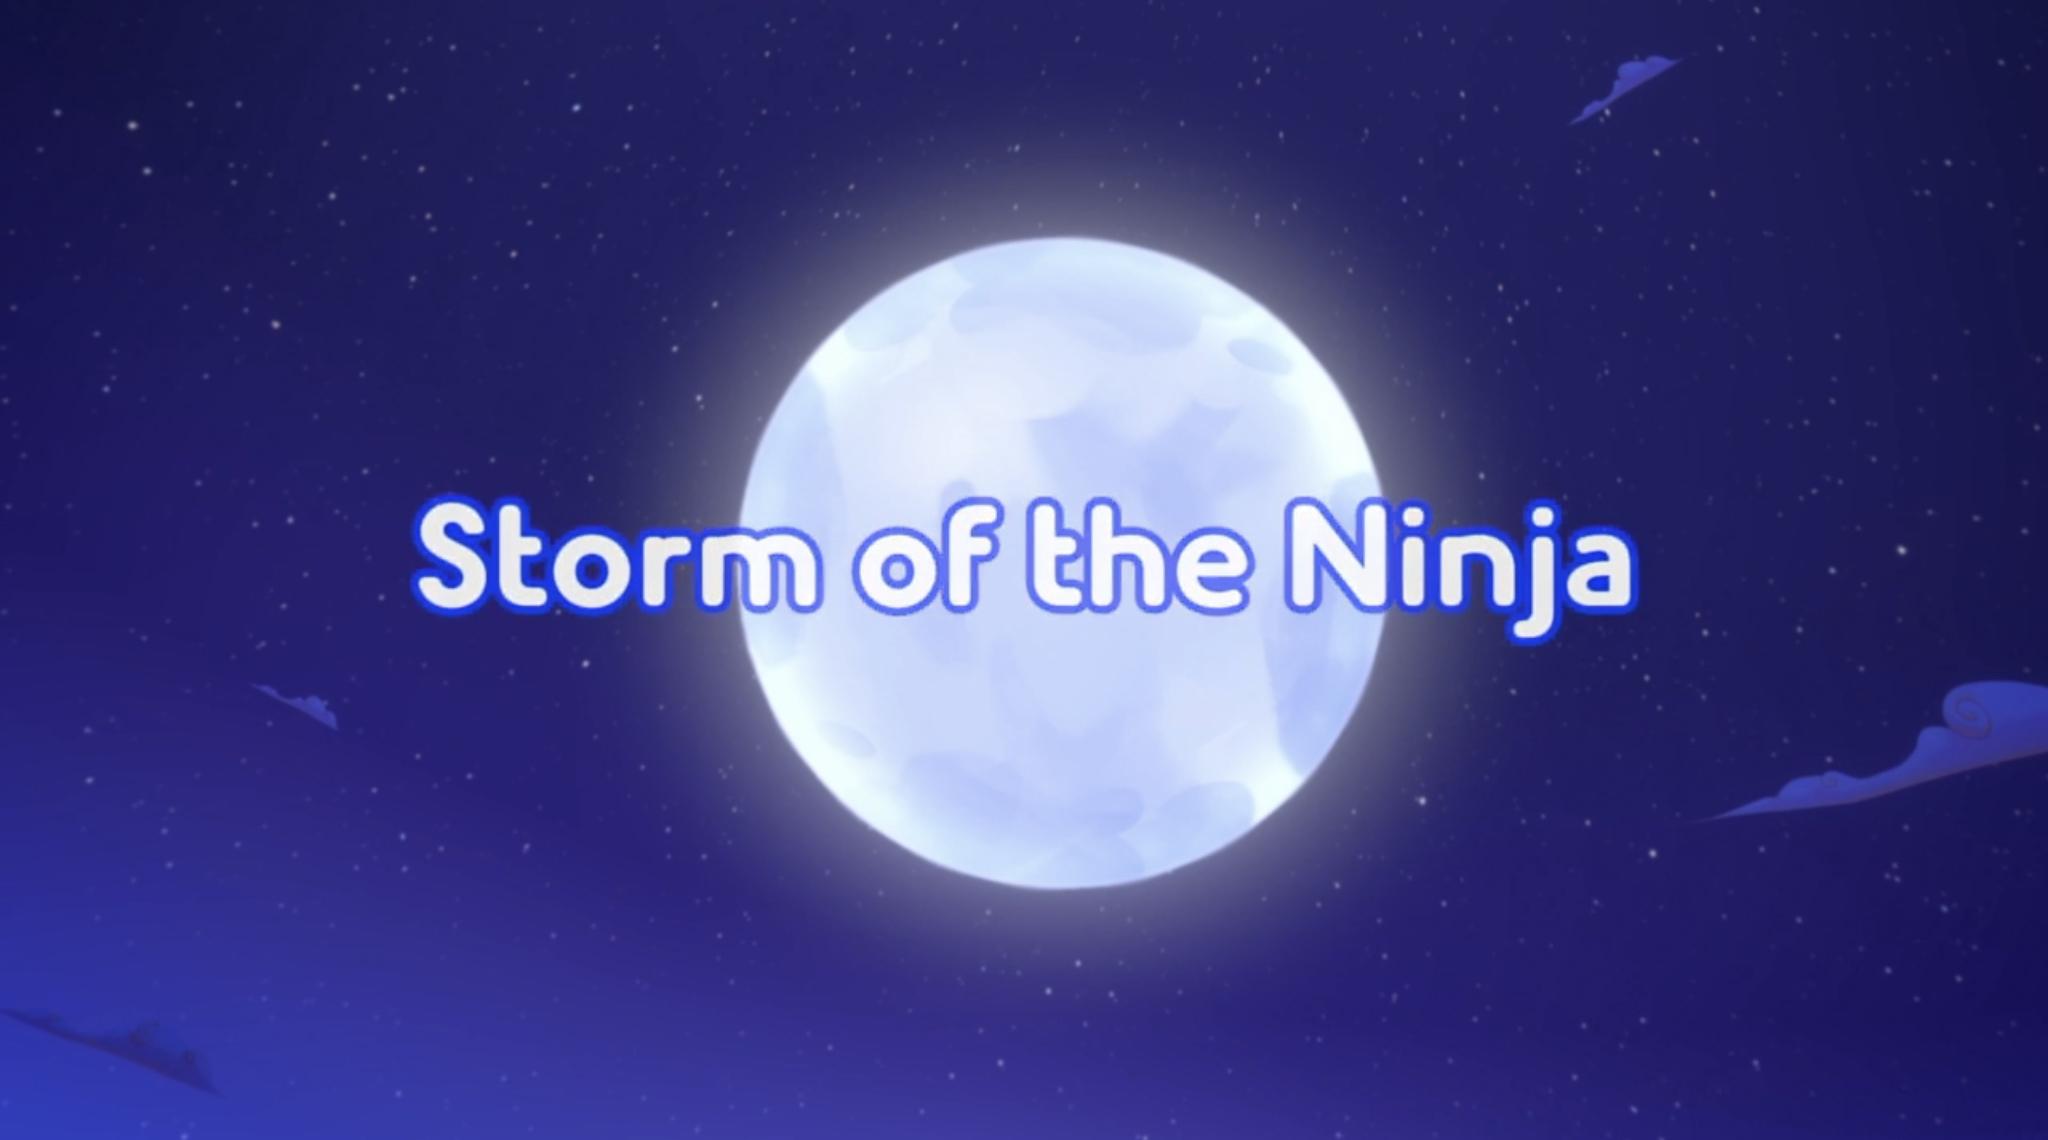 Storm of the Ninja